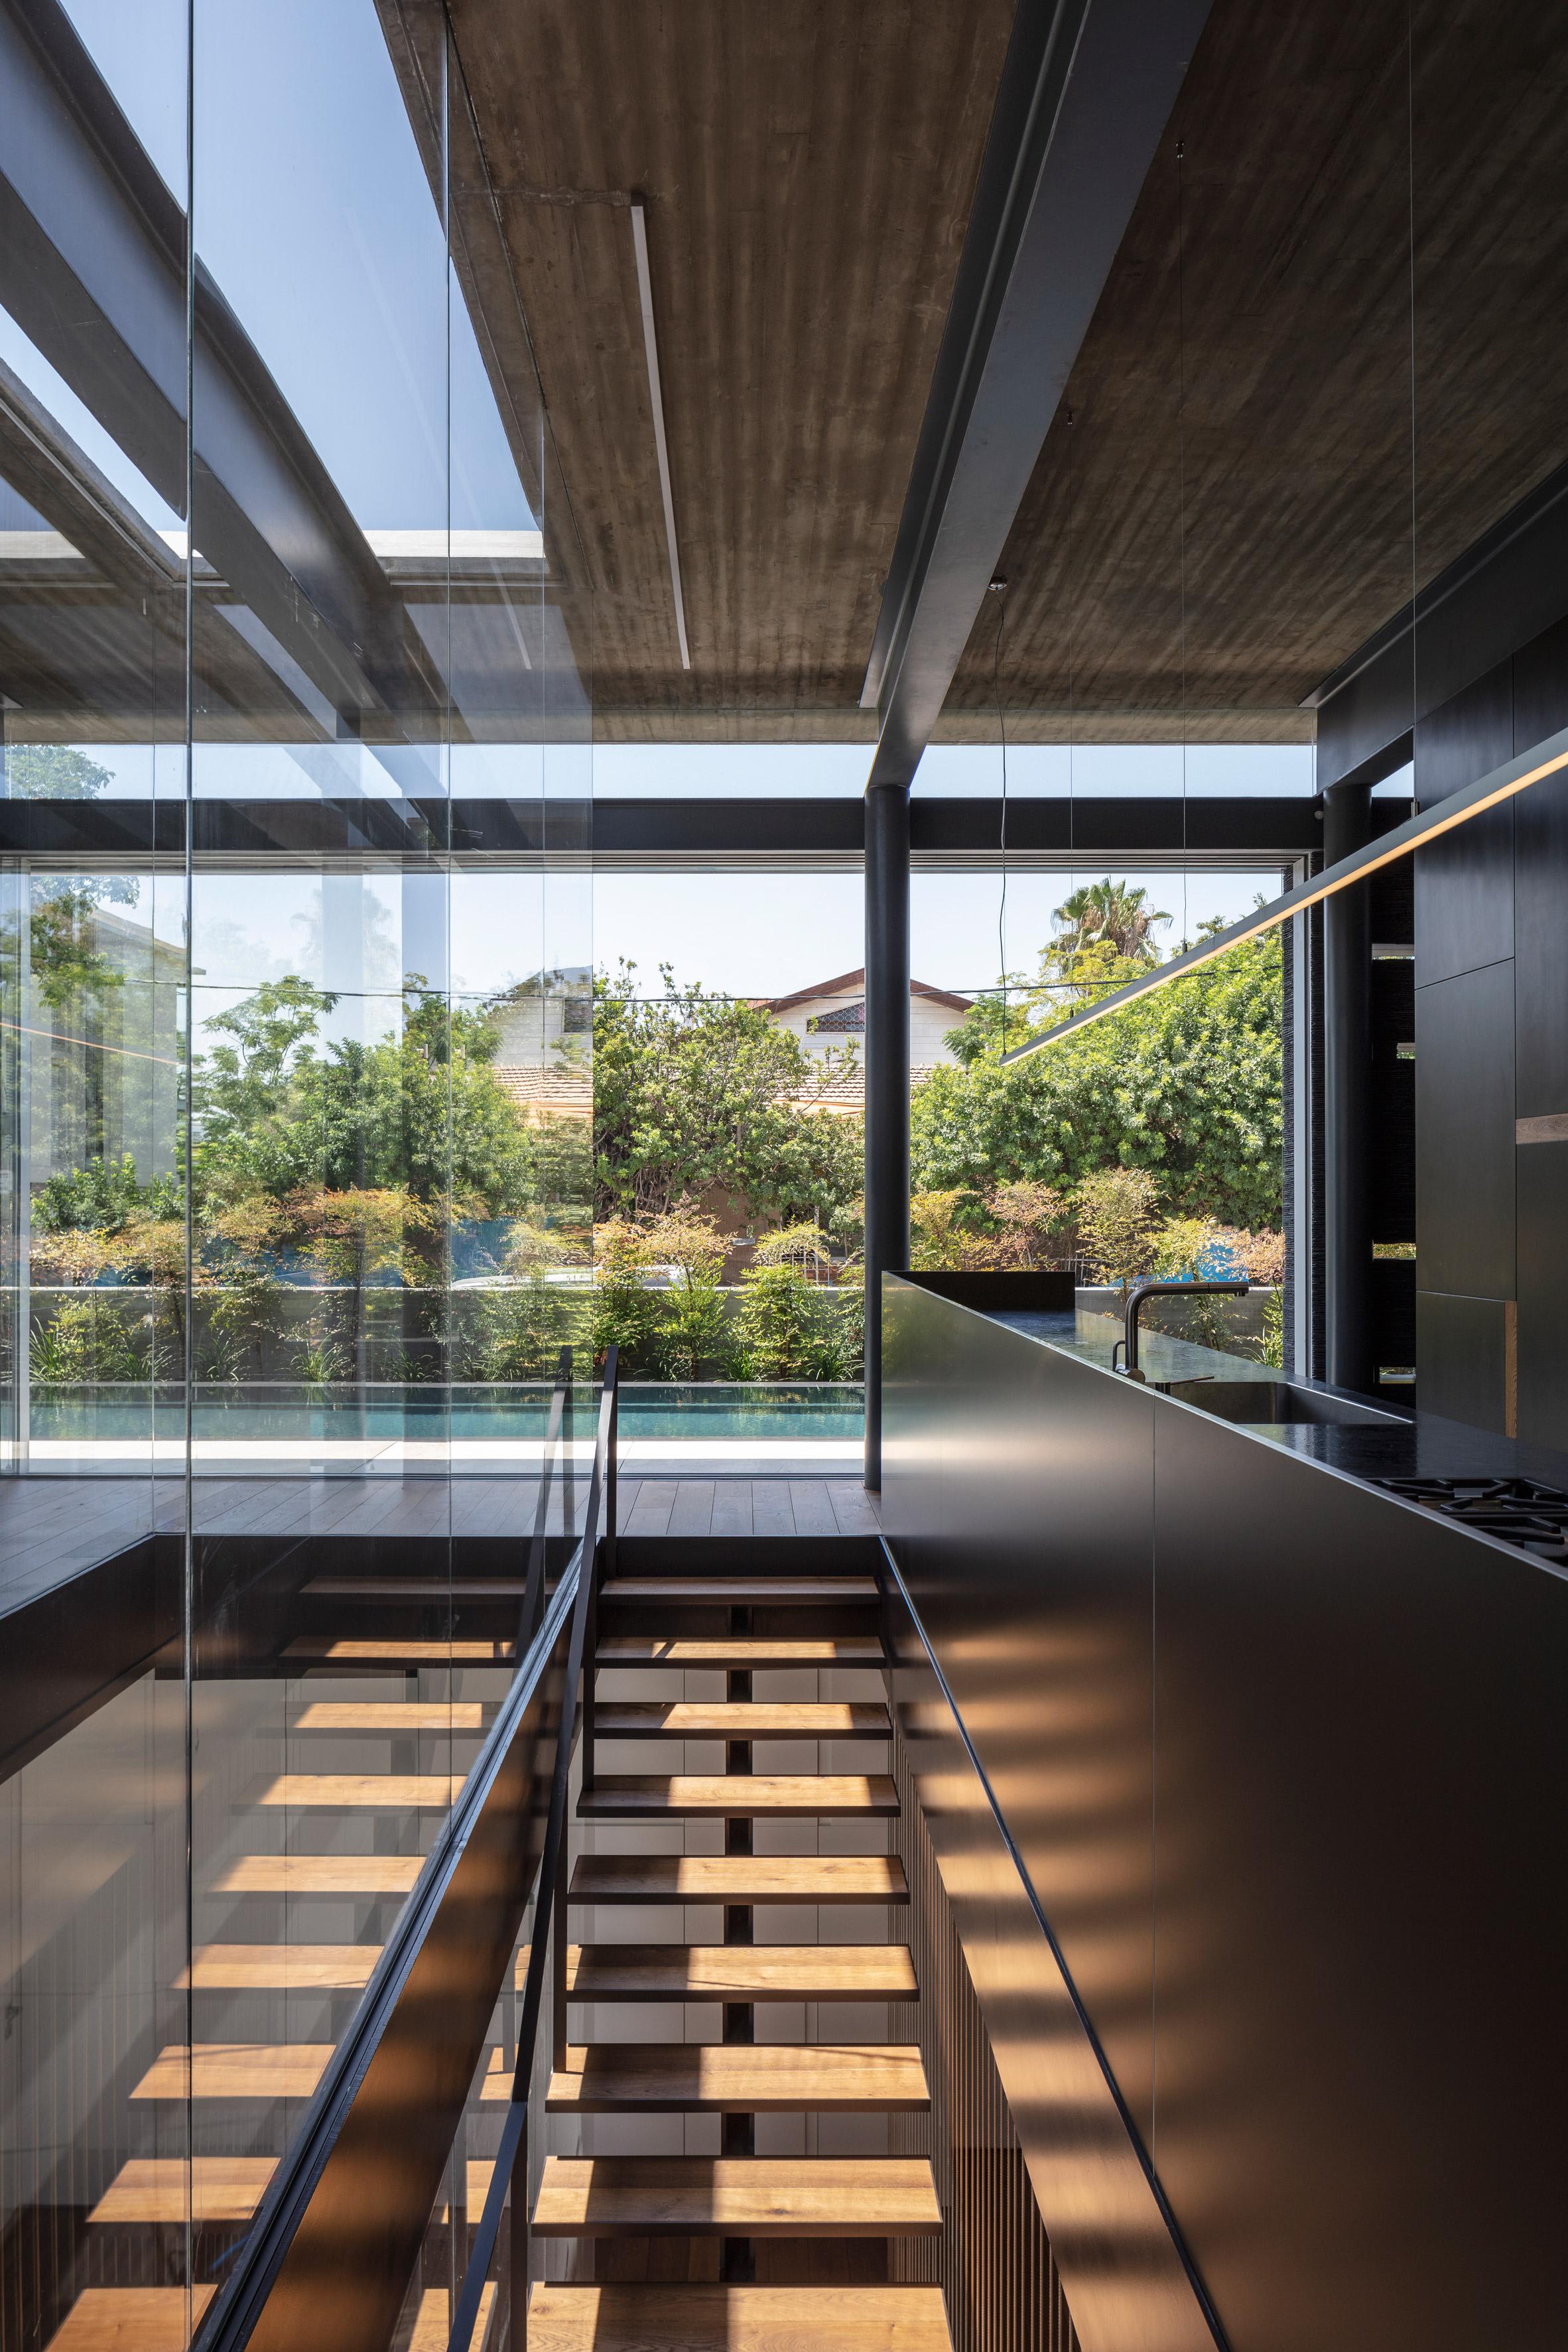 Pavilion House, Pitsou Kedem, Architect, luxury house, top house, luxurious, vip, billionaire, pool, linear swimming pool, lady, girl, sexy, Israel, floor, livingroom, bathroom,